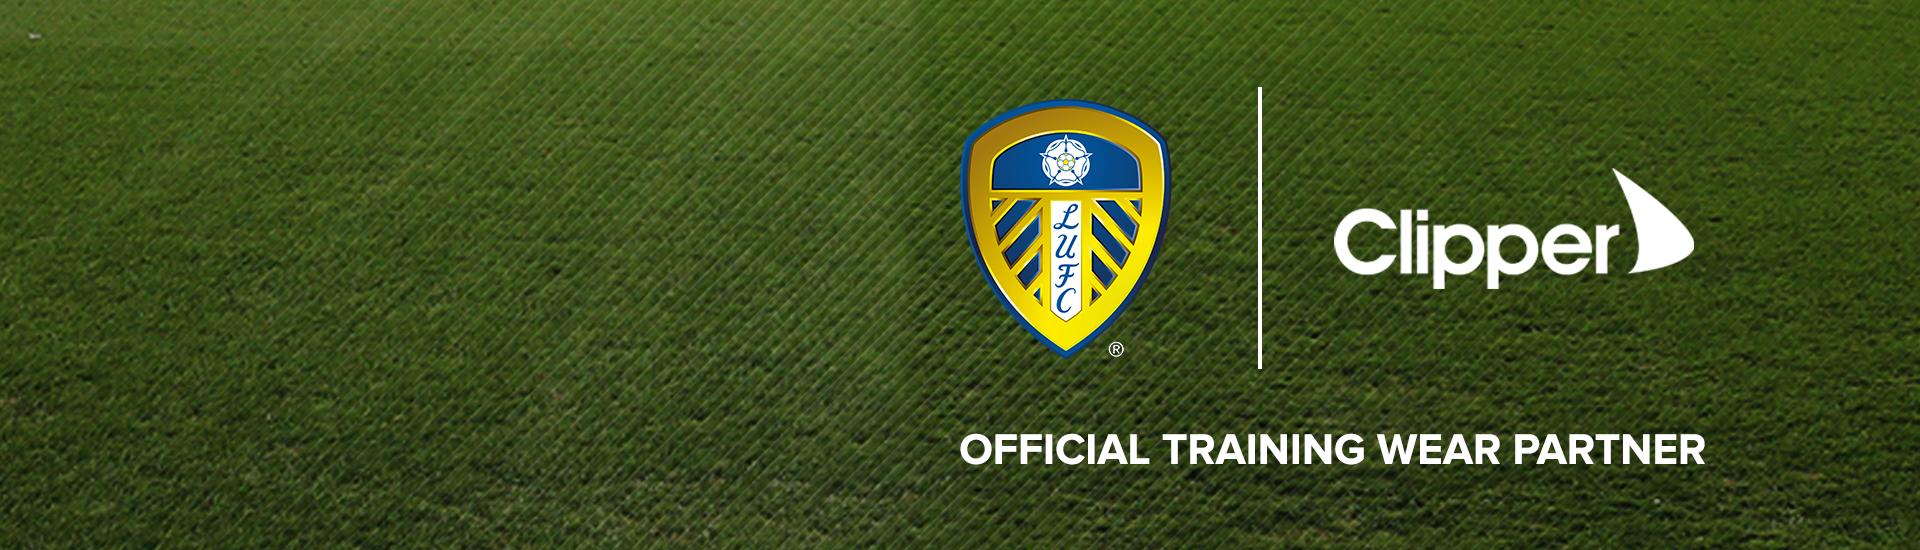 Clipper Sign New Leeds United Sponsorship Deal Leeds United